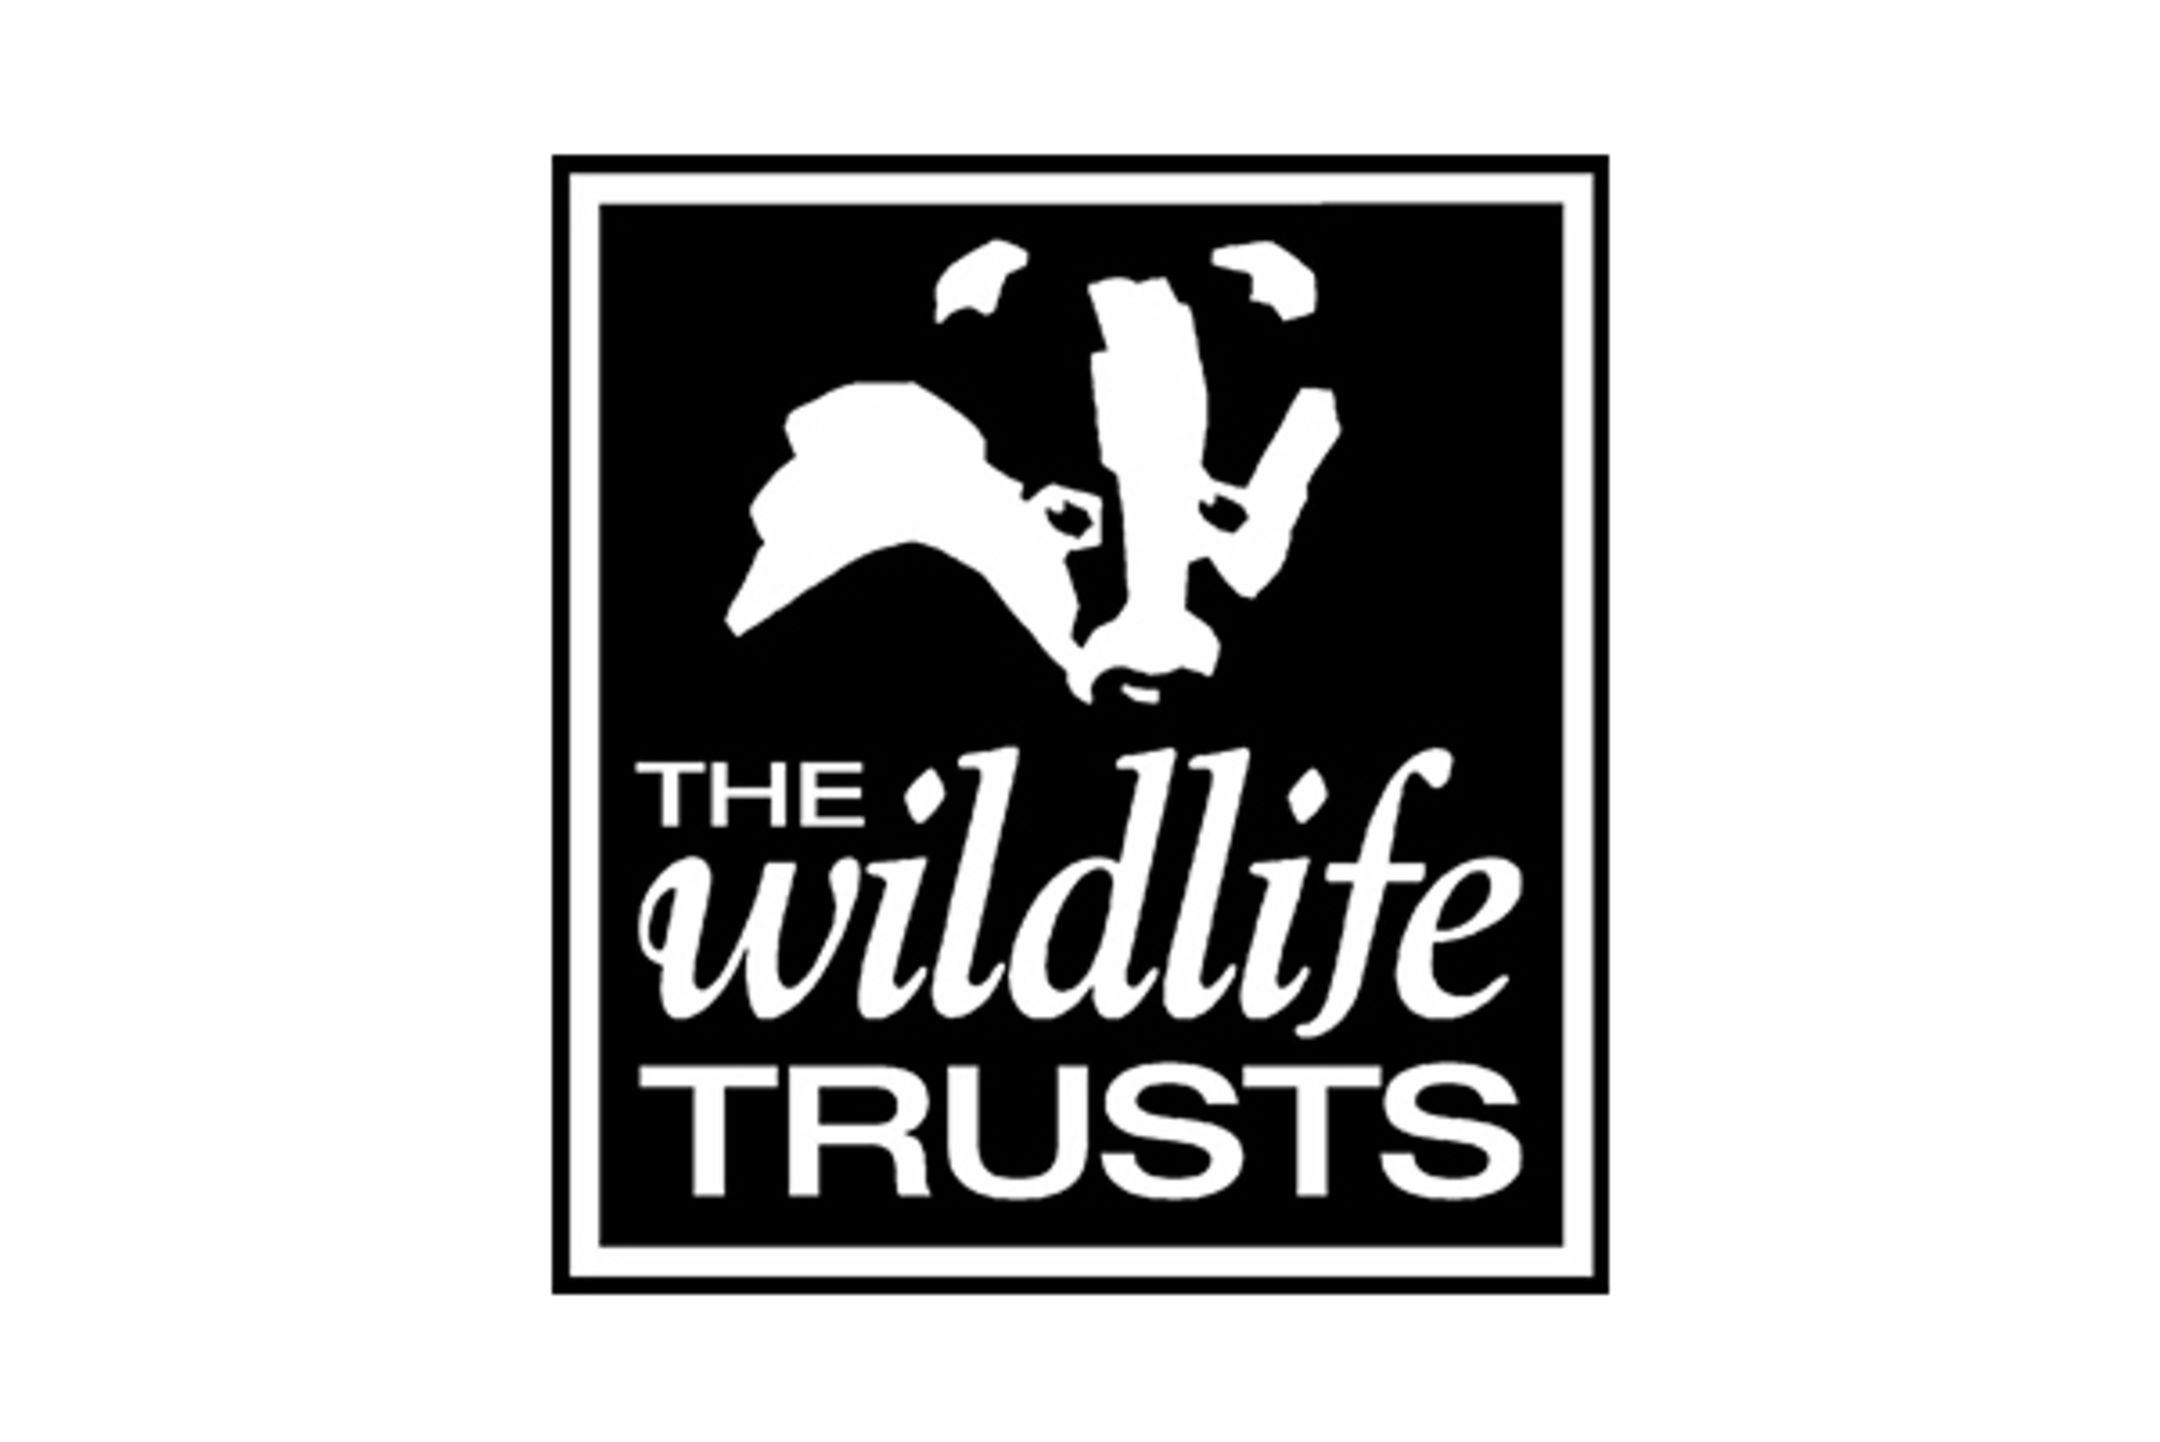 The Wildlife Trusts logo.